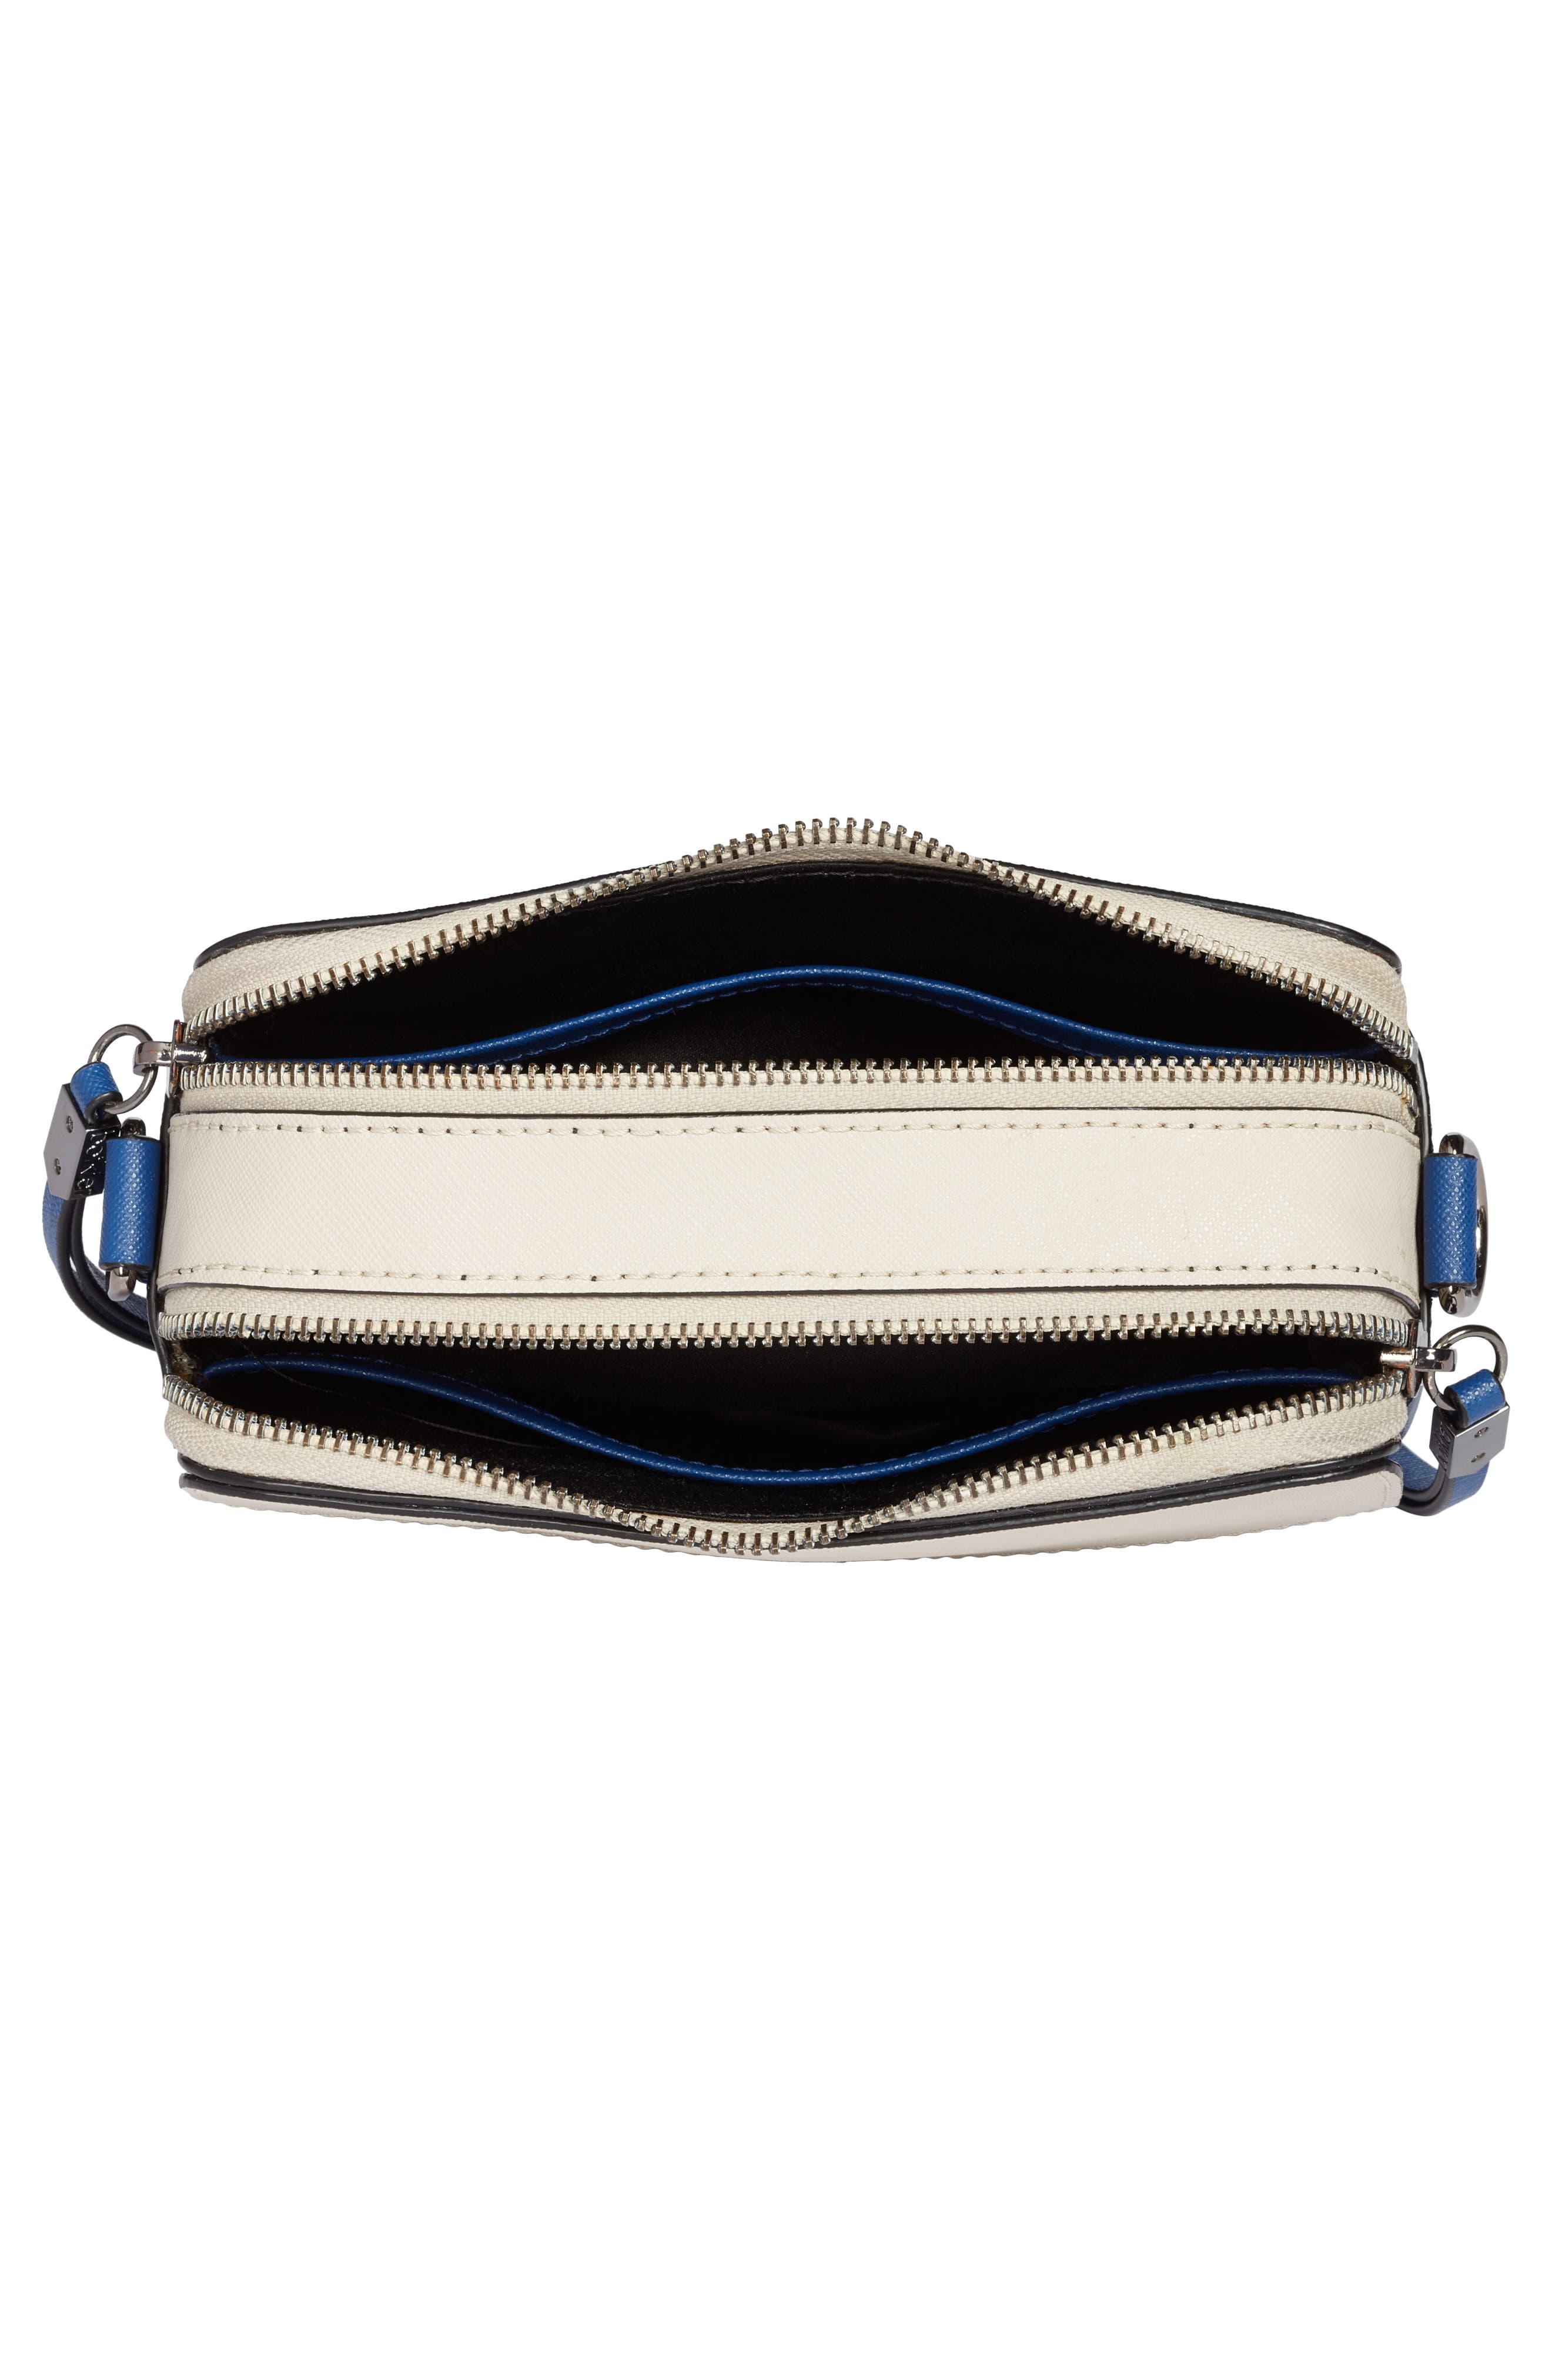 Cobble Hill Mini Crossbody Camera Bag,                             Alternate thumbnail 4, color,                             WINTER BLUE COMBO